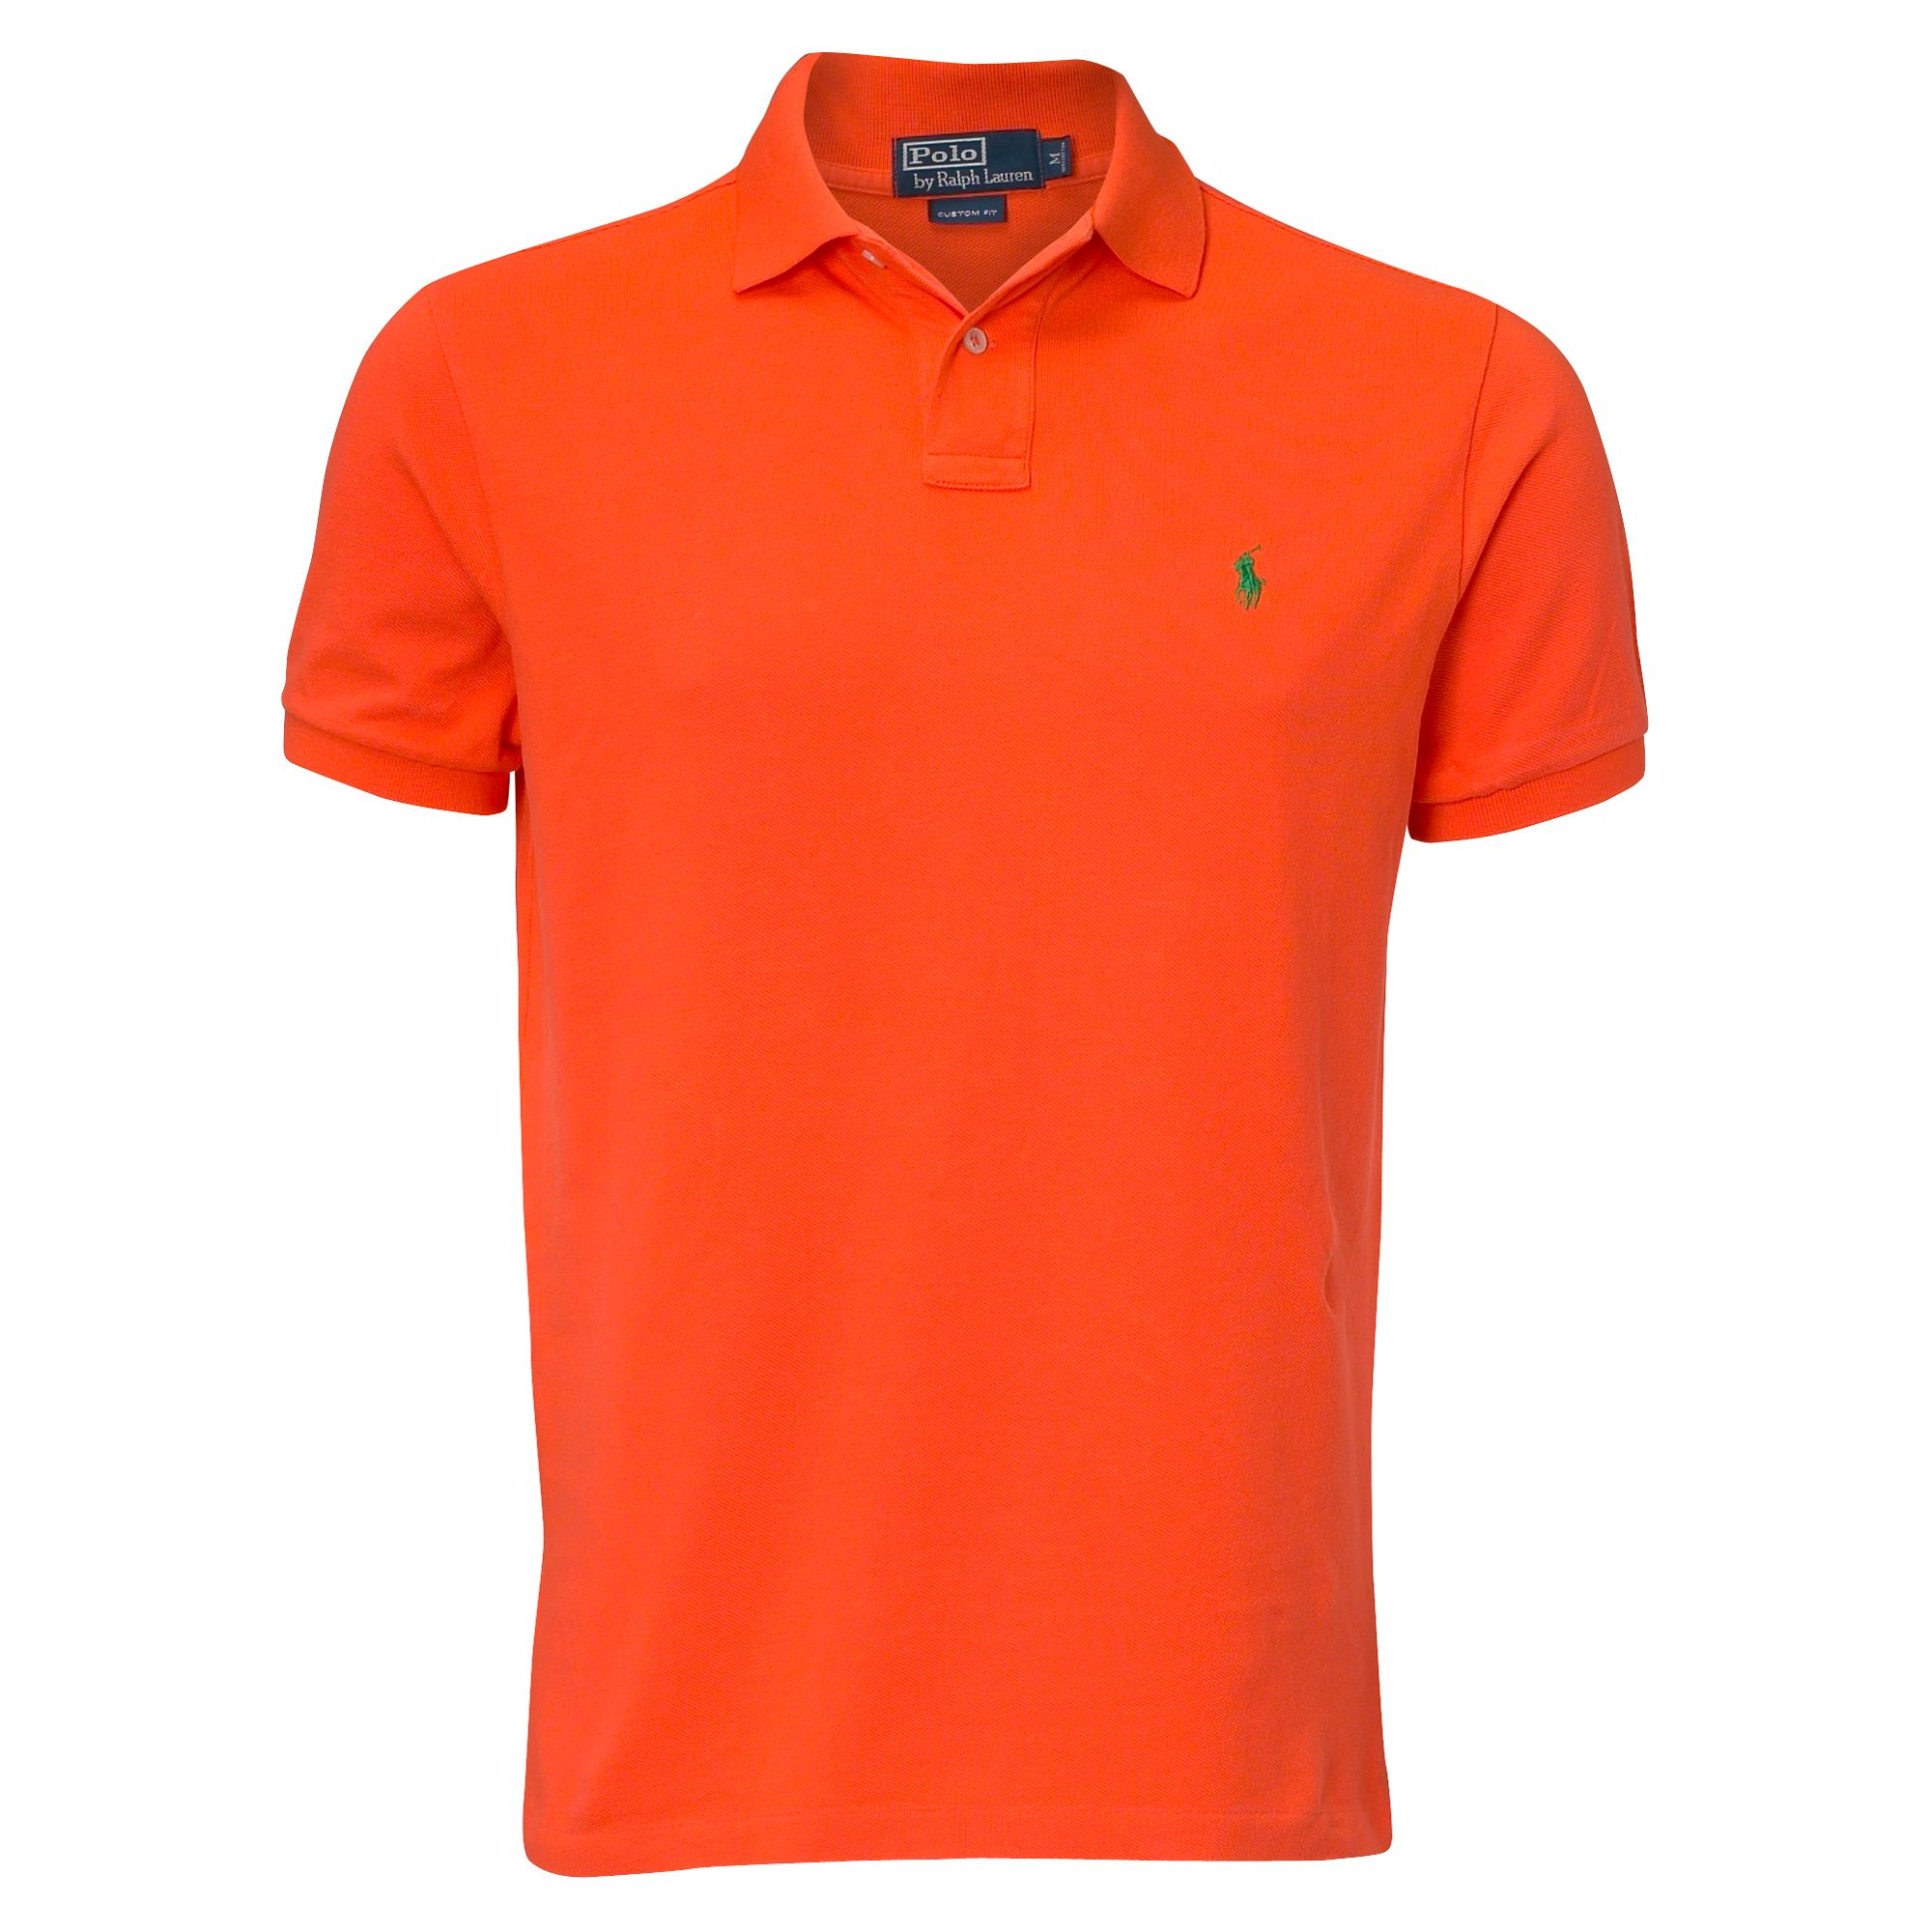 Polo ralph lauren custom fit mesh polo shirt in orange for for Polo ralph lauren custom fit polo shirt